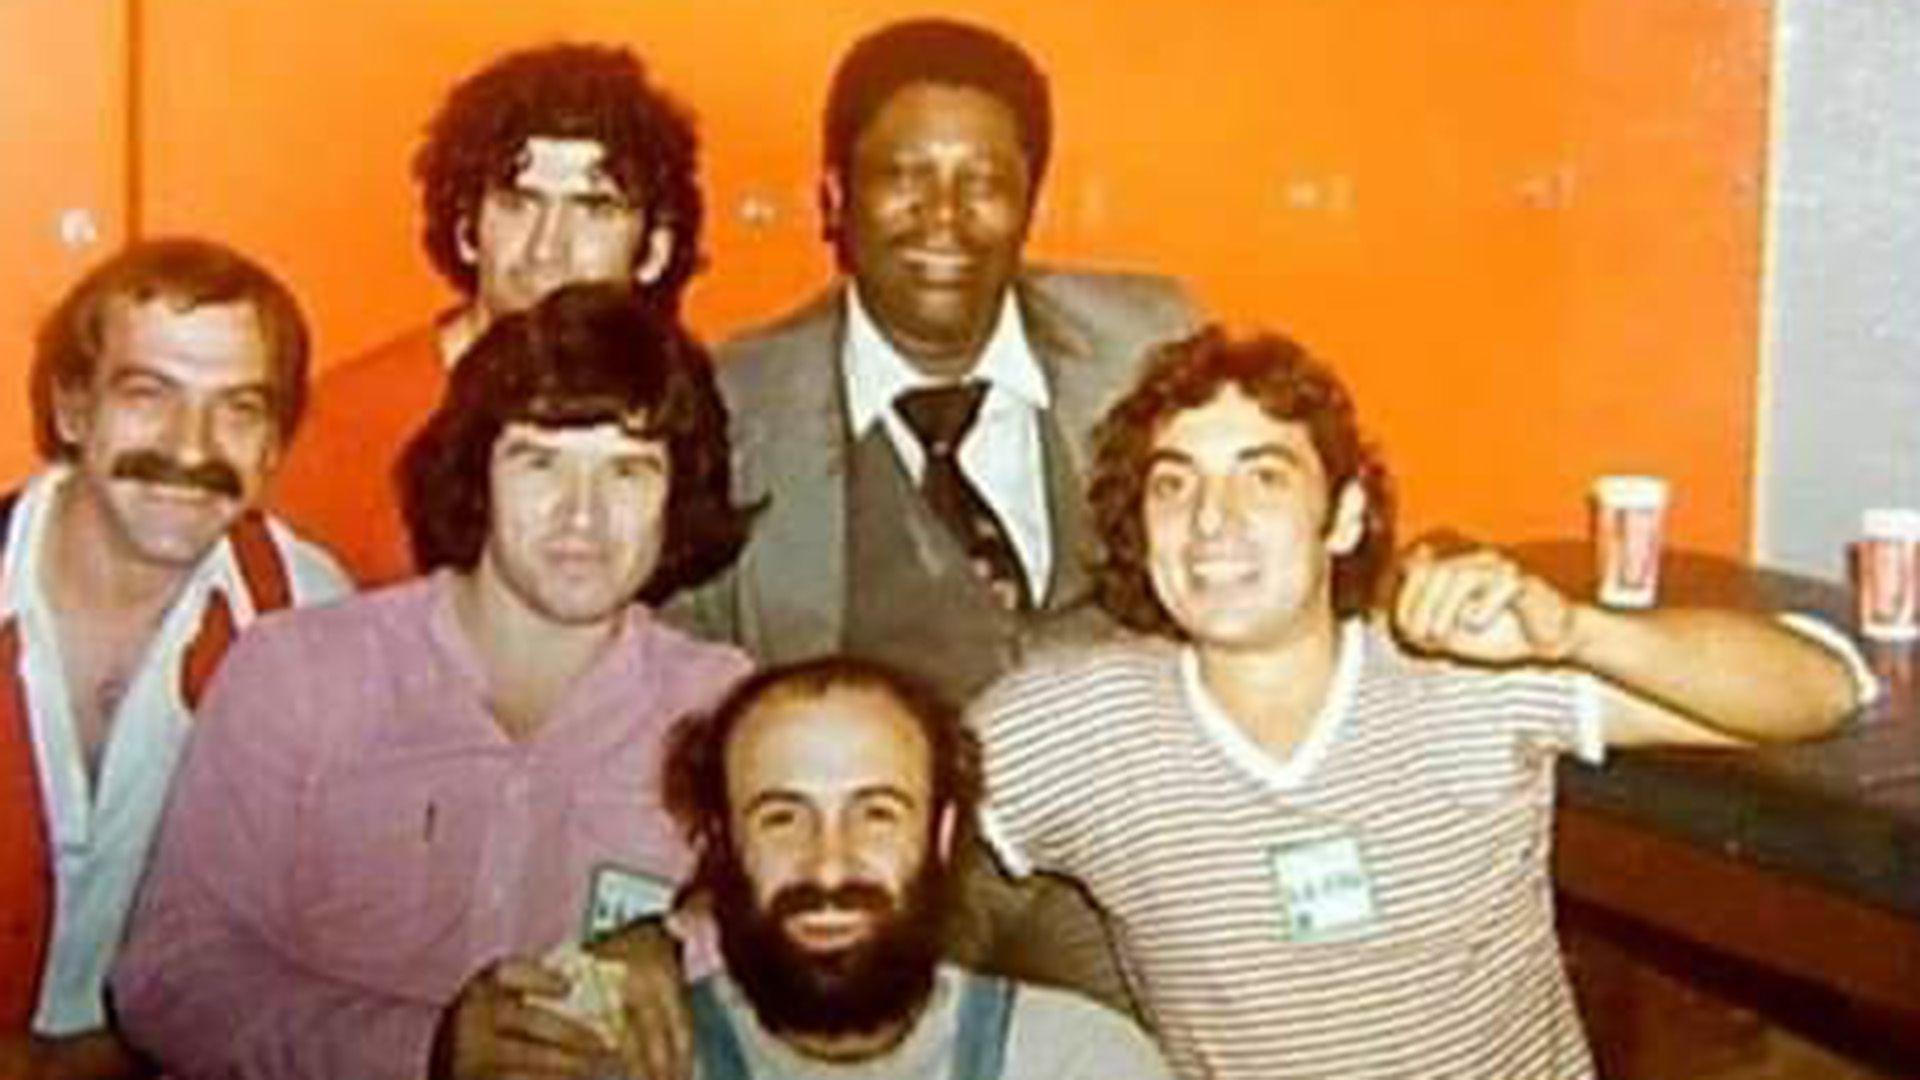 Willy Quiroga, Rinaldo Rafanelli, Héctor Starc y Pappo, junto a B.B, King en 1980